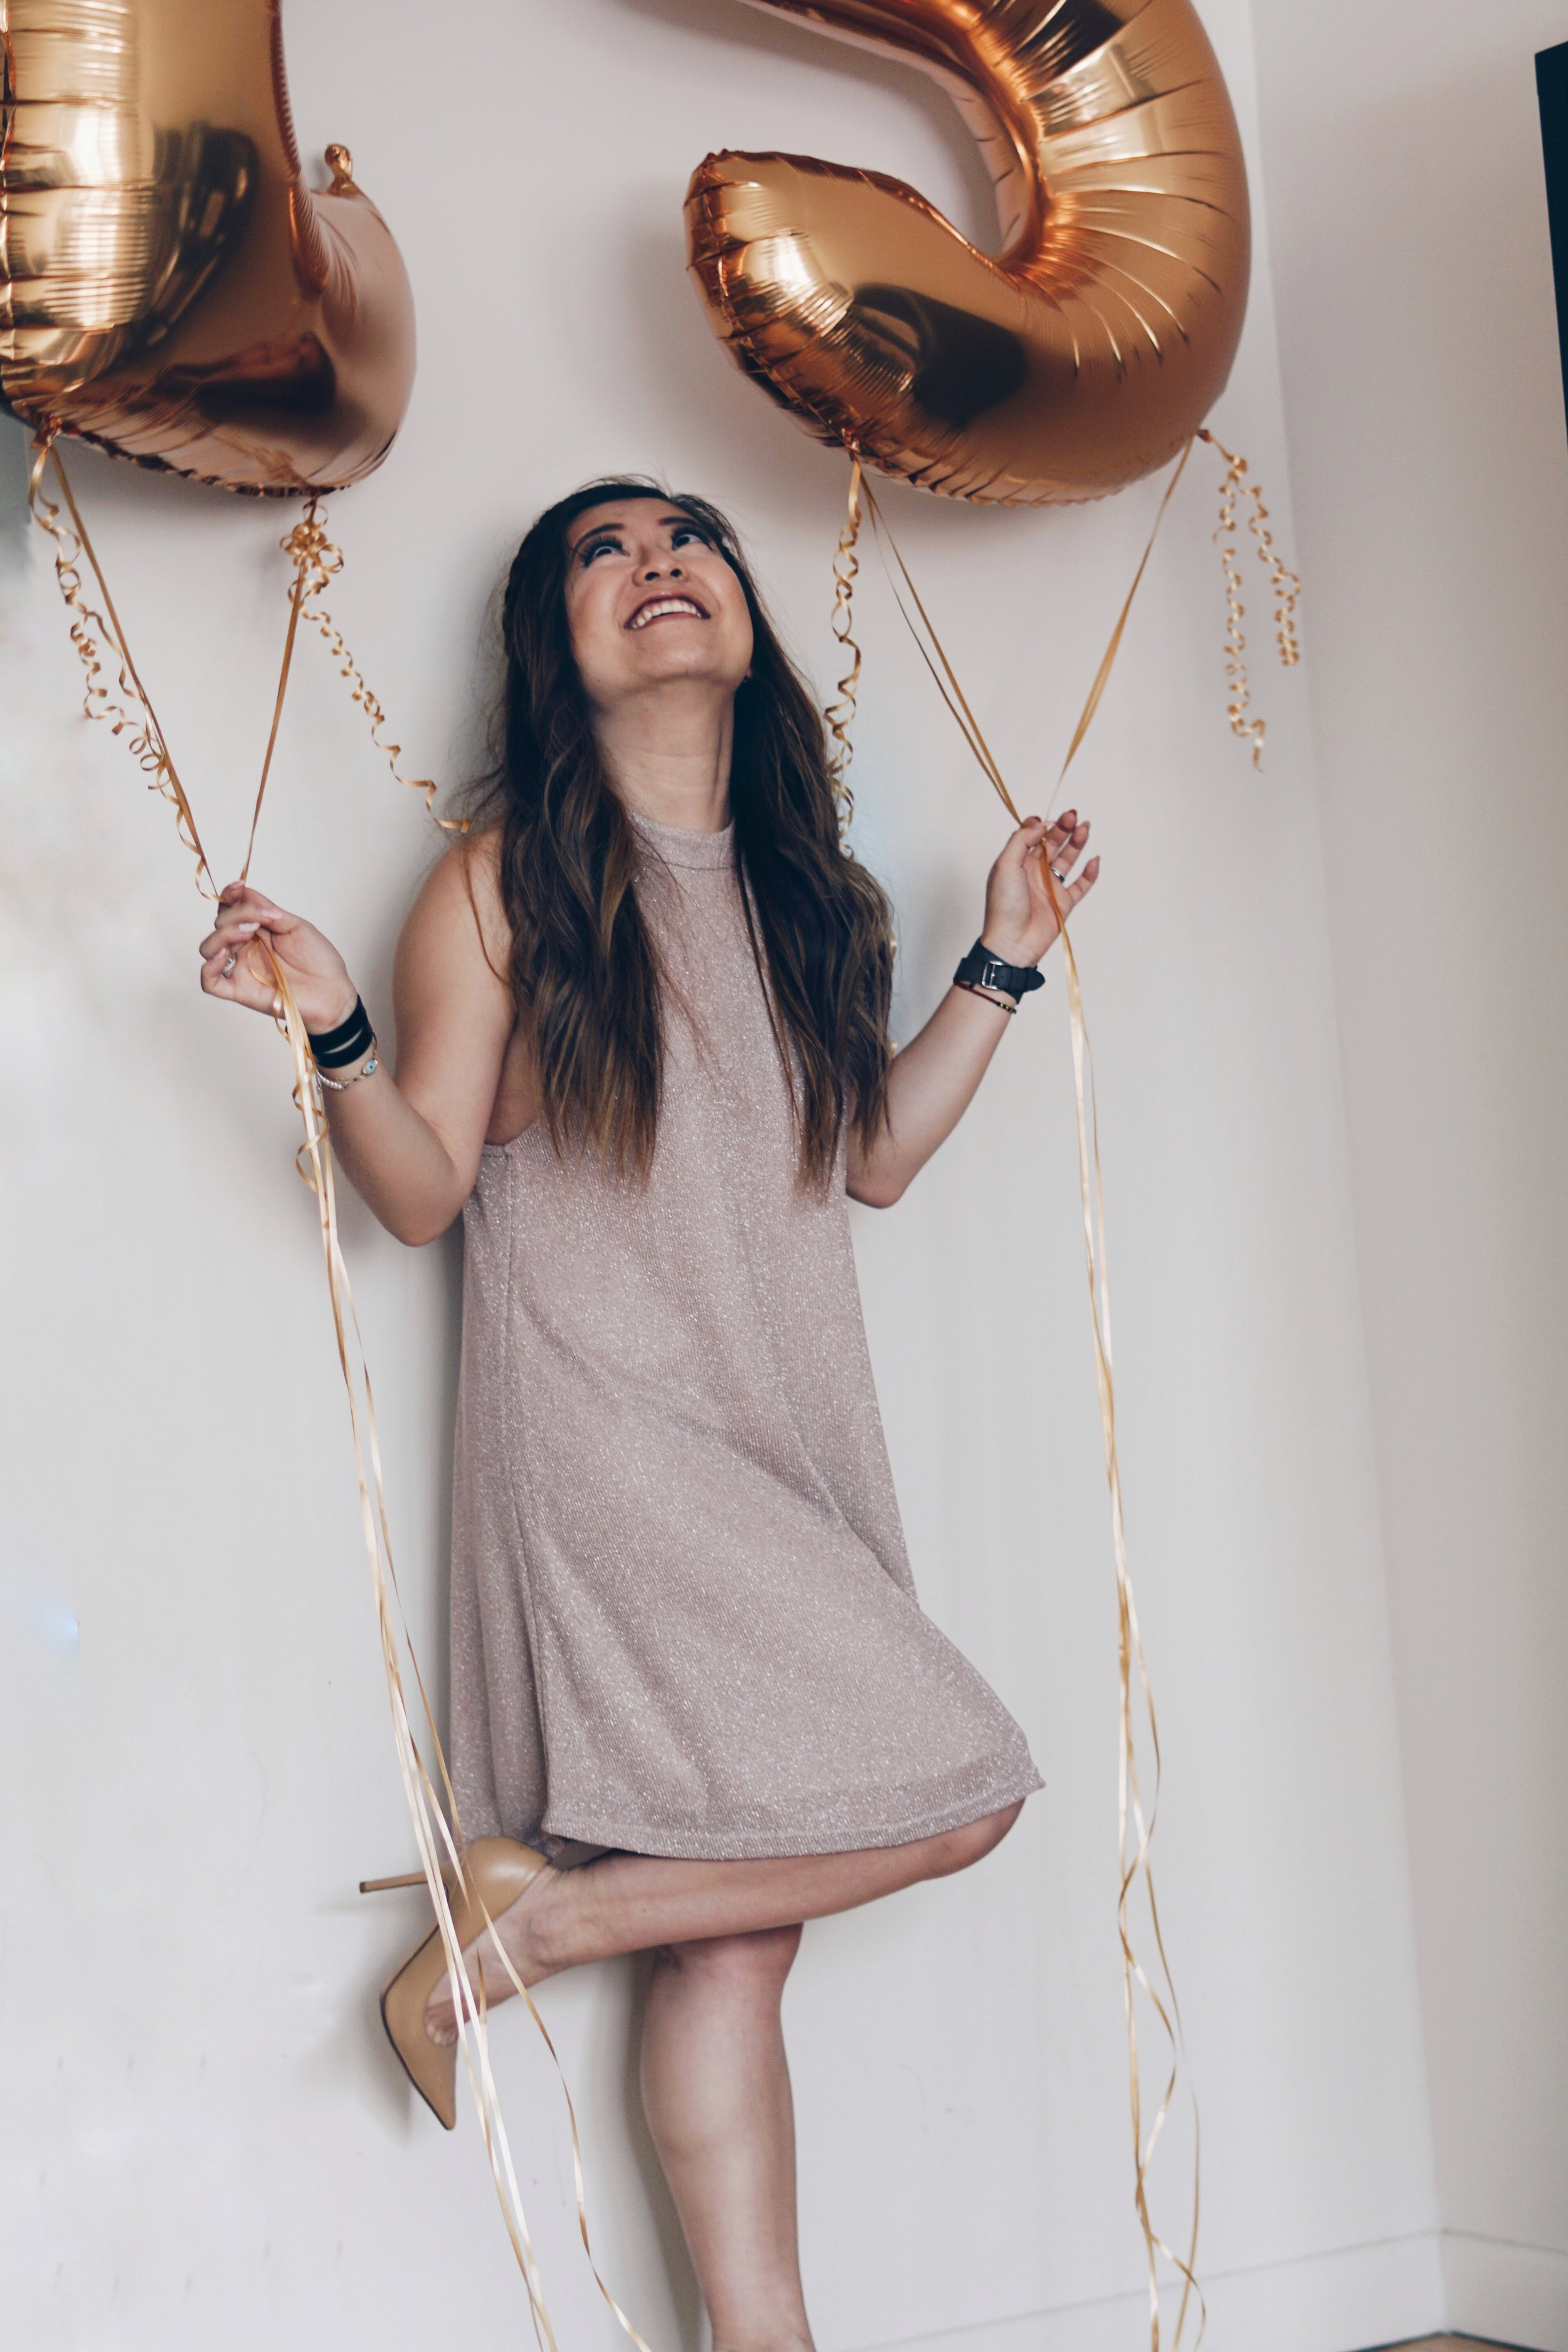 Dress:  Tobi   Shoes:  Jimmy Choo (Similar Style)   Jewelry & Watch: Hermes   Balloons:  Balloon Kings